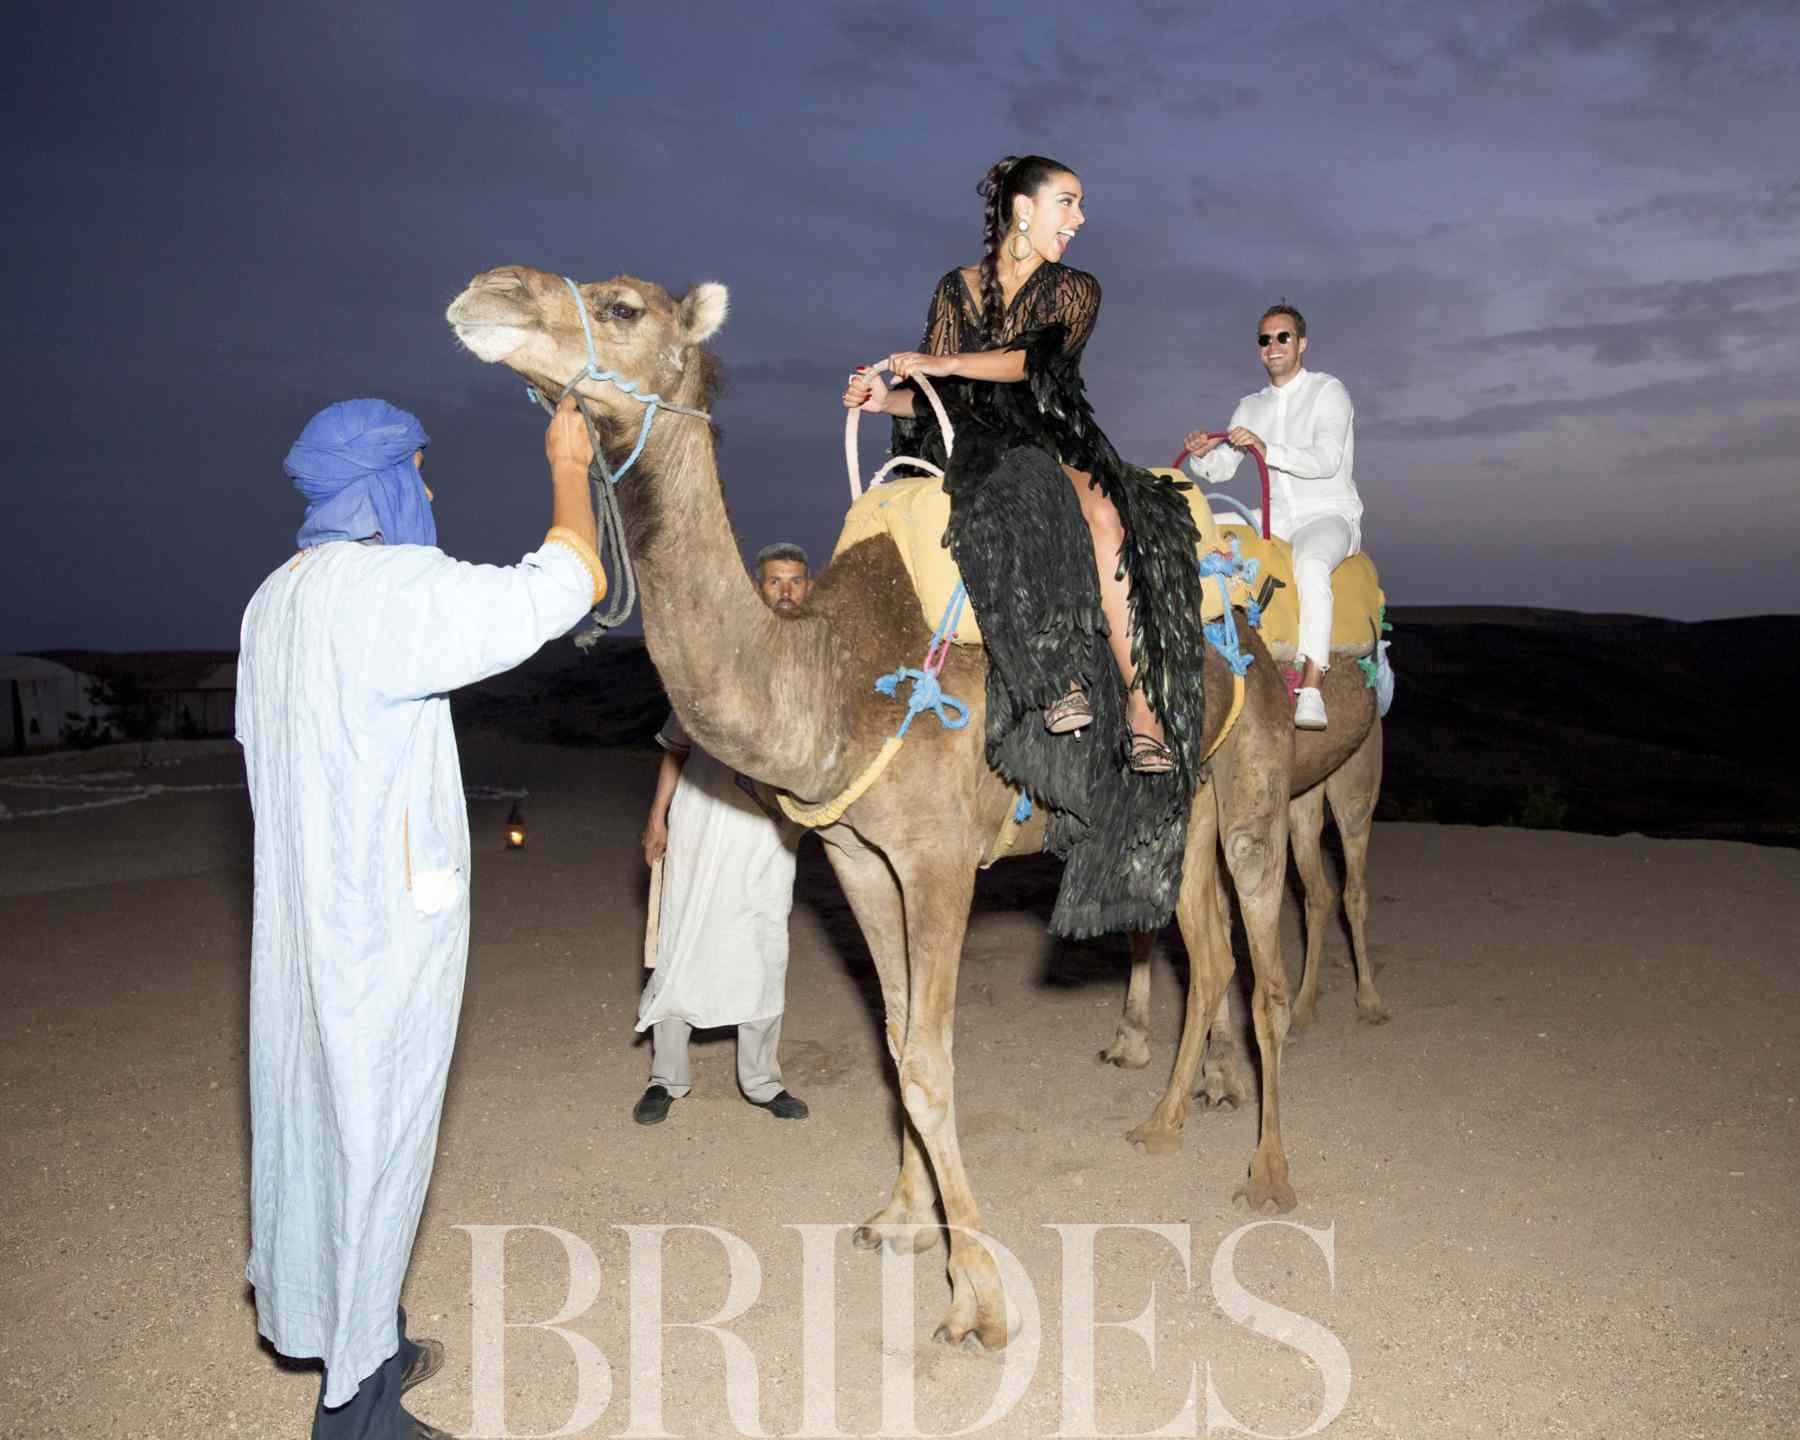 Bride on Camel in Morocco